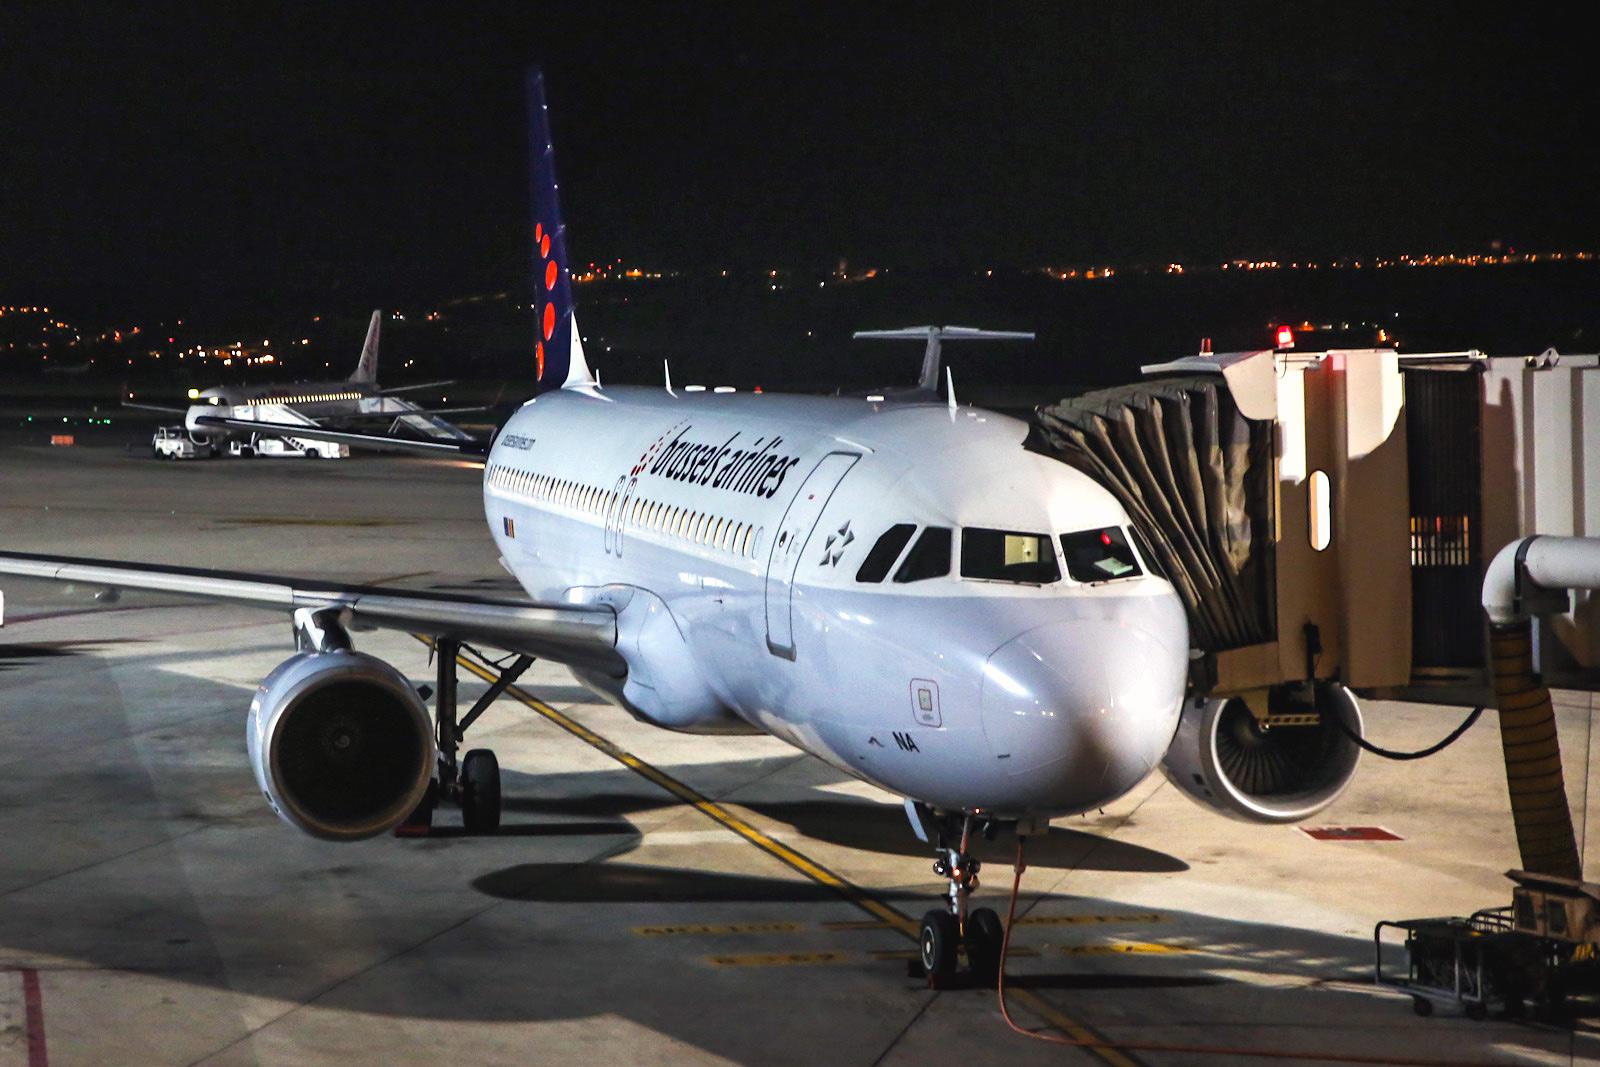 Airbus A320 Brussels Airlines в аэропорту Мадрид Барахас